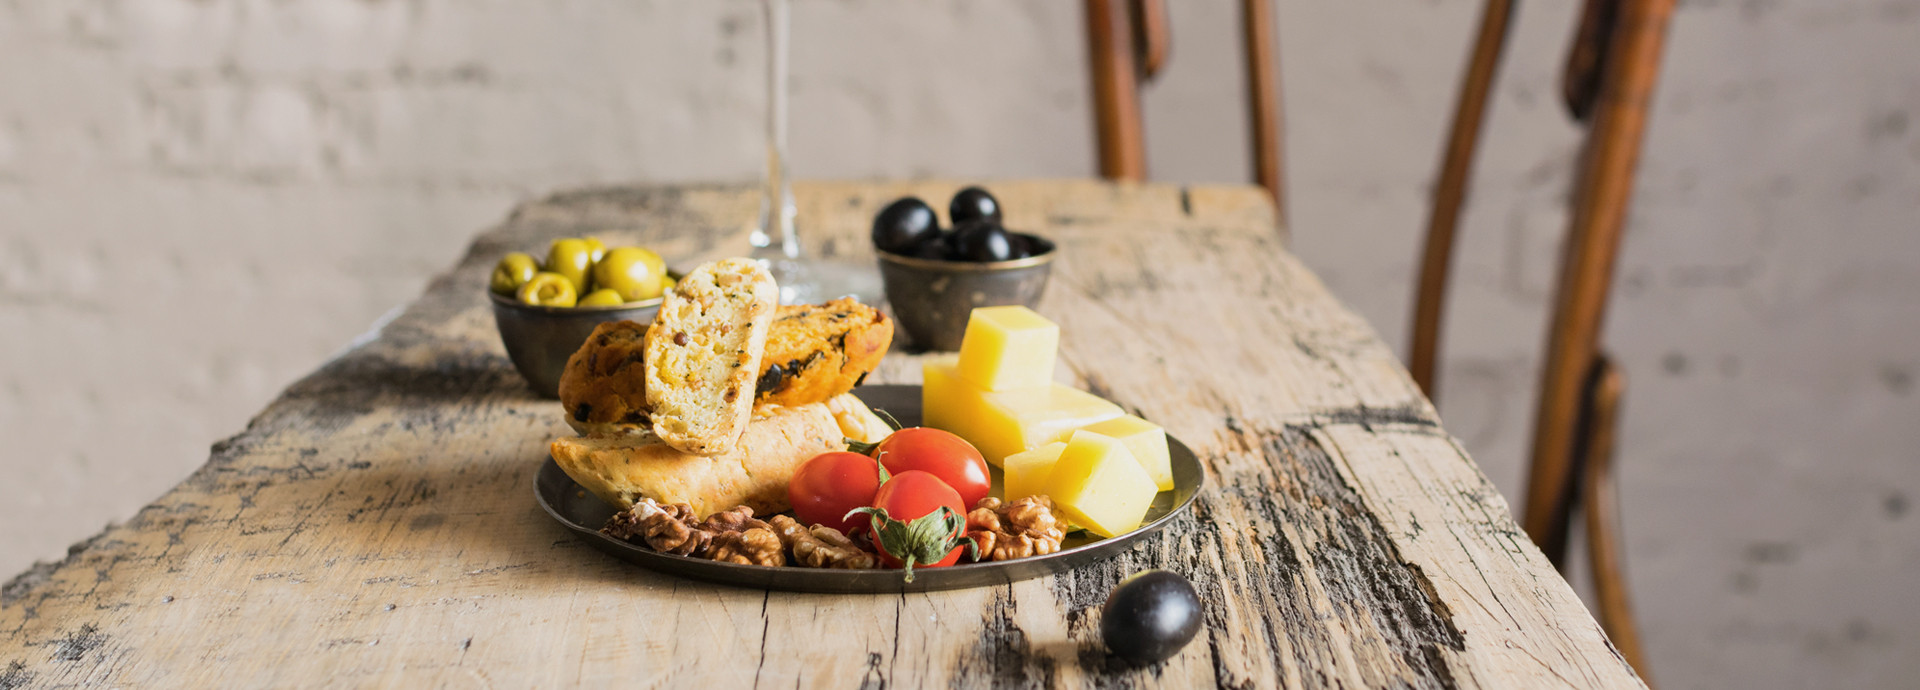 Carrefour Charlesbourg - Alimentation et boissons